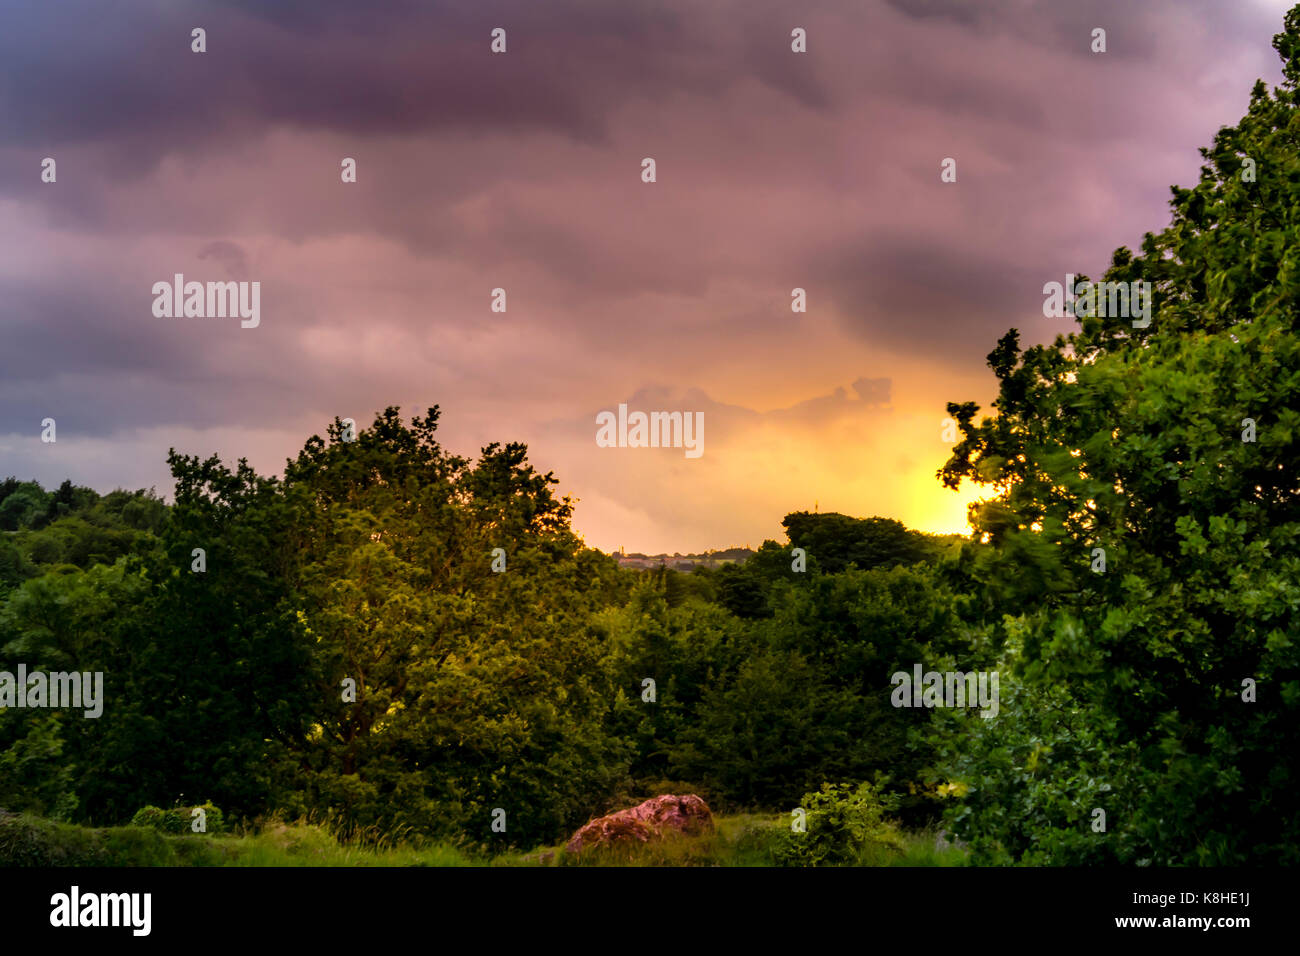 Sun behind trees in Anston Stones, Anston - Stock Image